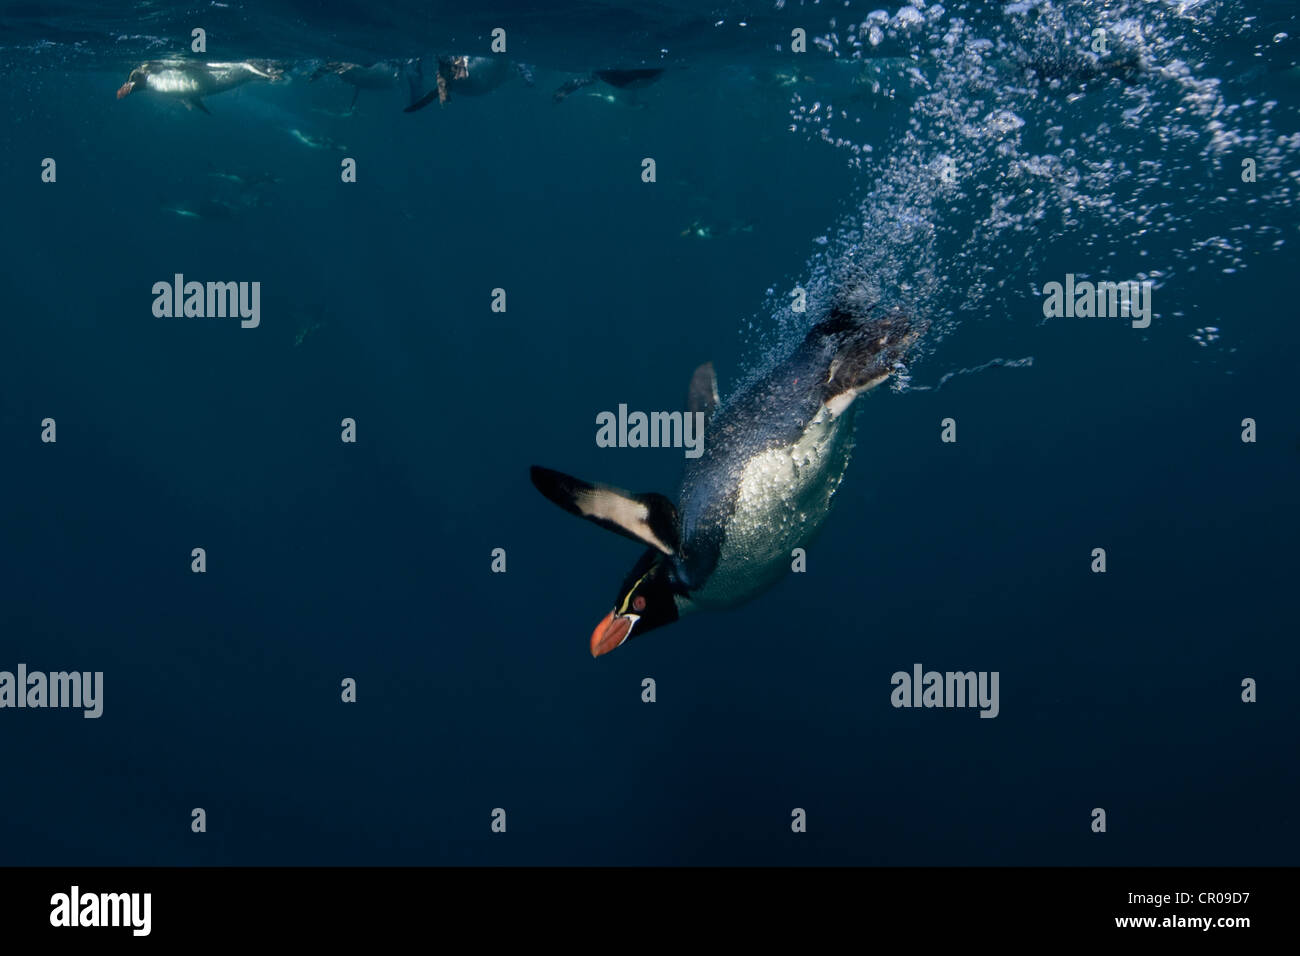 Crested penguin swimming underwater - Stock Image